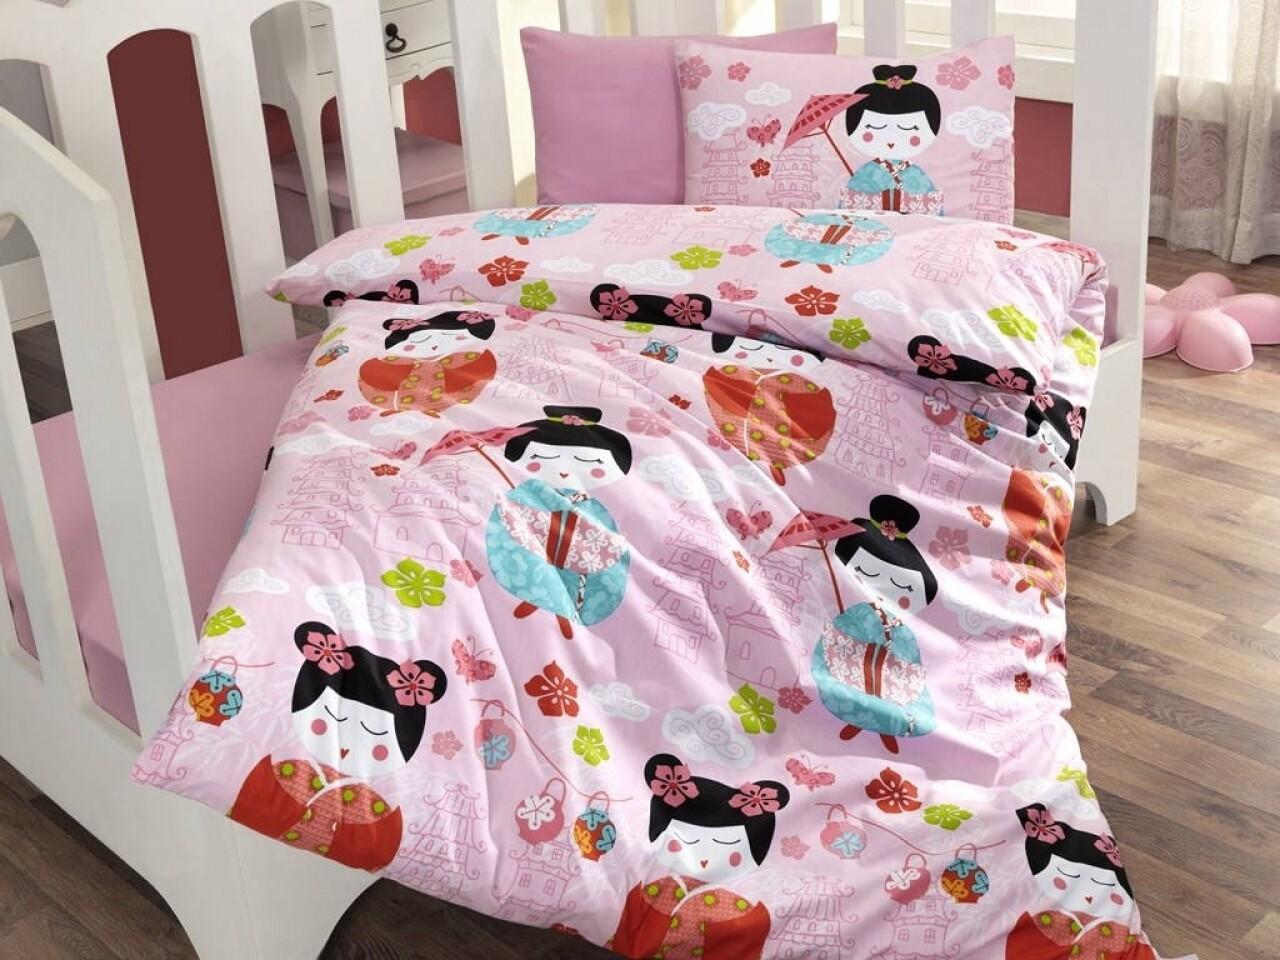 Lenjerie de pat pentru copii, 4 piese, 100% bumbac ranforce, Cotton Box, Kucuk Hanim